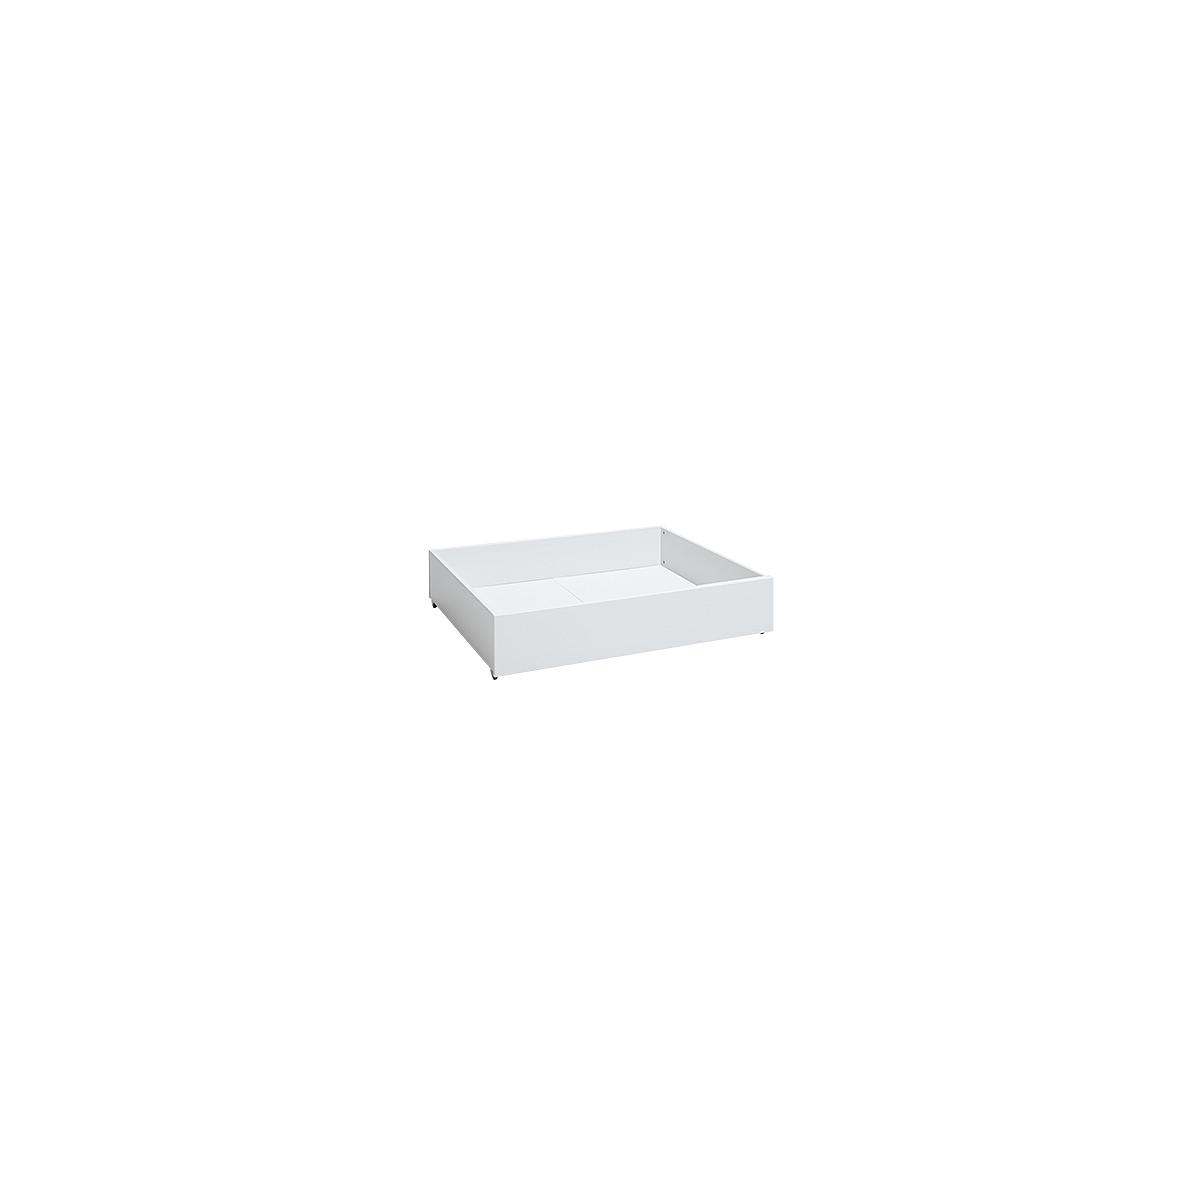 Cajón cama 90x99cm Lifetime blanco